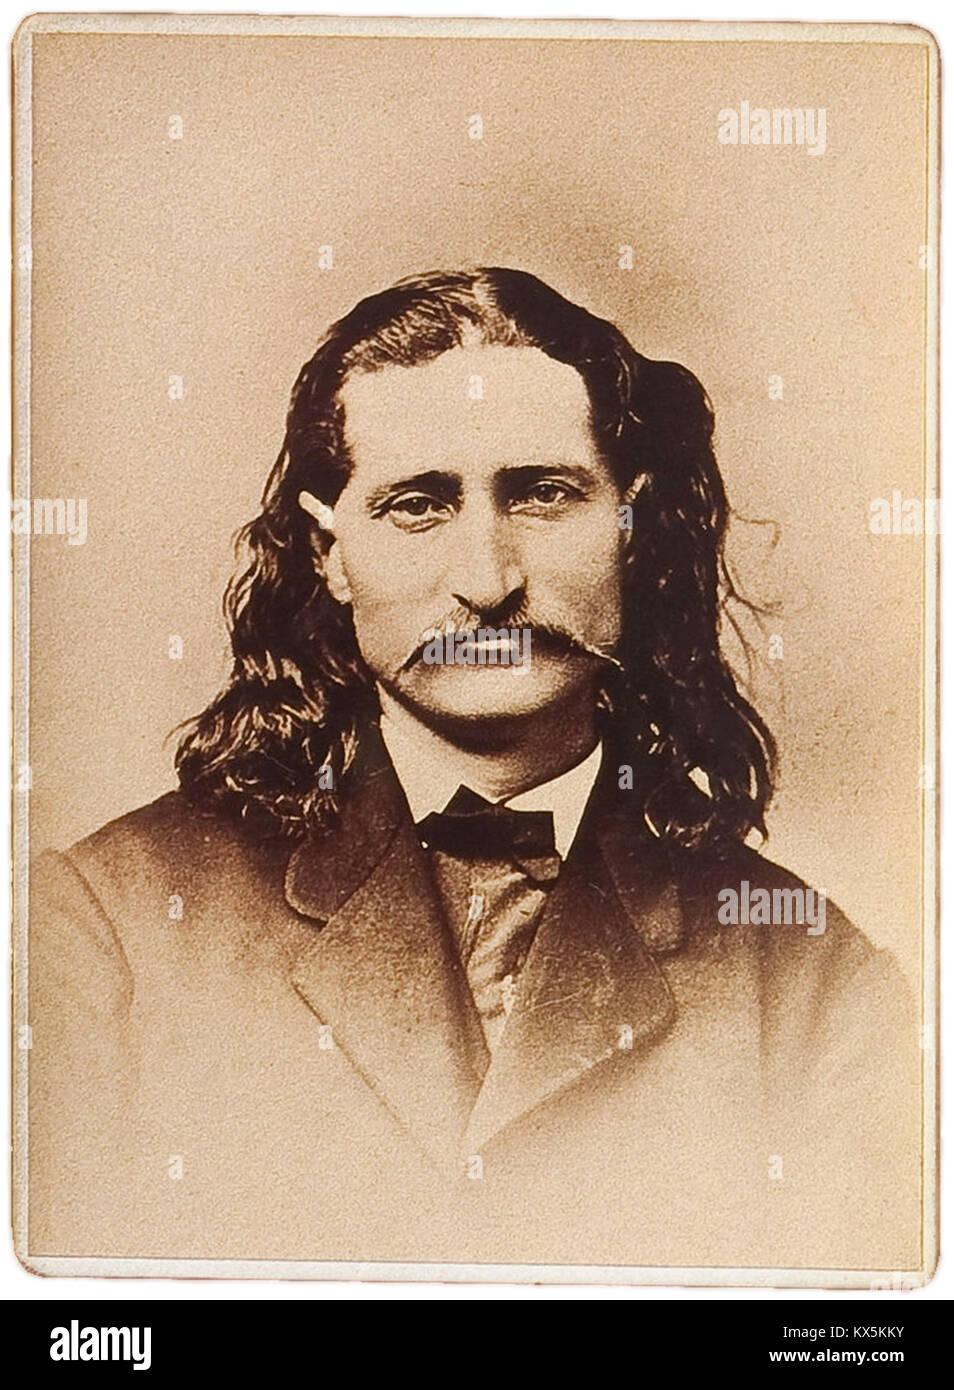 James Butler Hickok, 'Wild Bill' Hickok, James Hickok was a folk hero of the American Old West - Stock Image